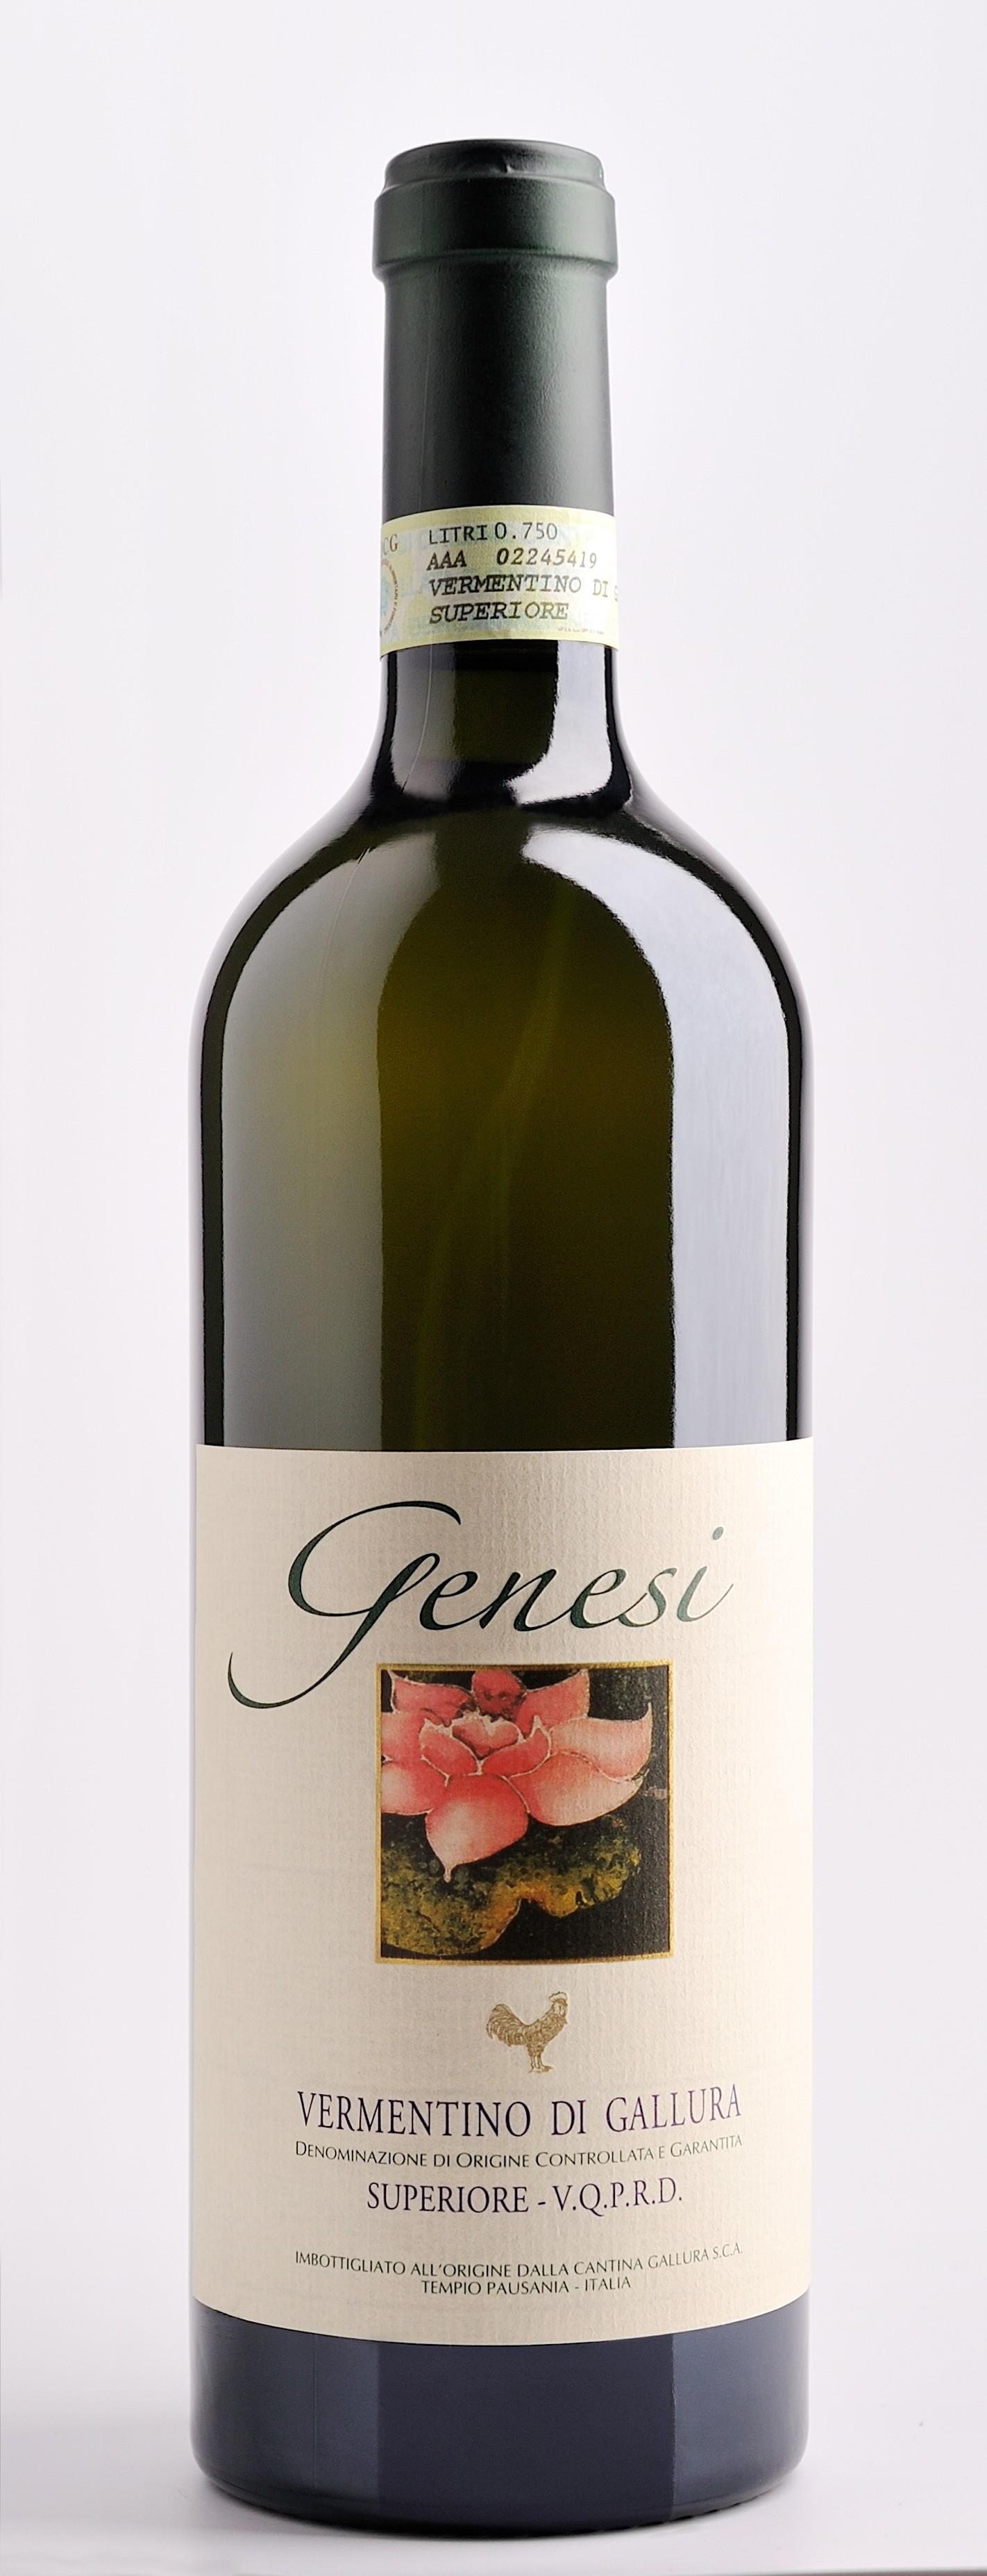 http://www.wineandgallery.cz/299-thickbox_default/genesi.jpg